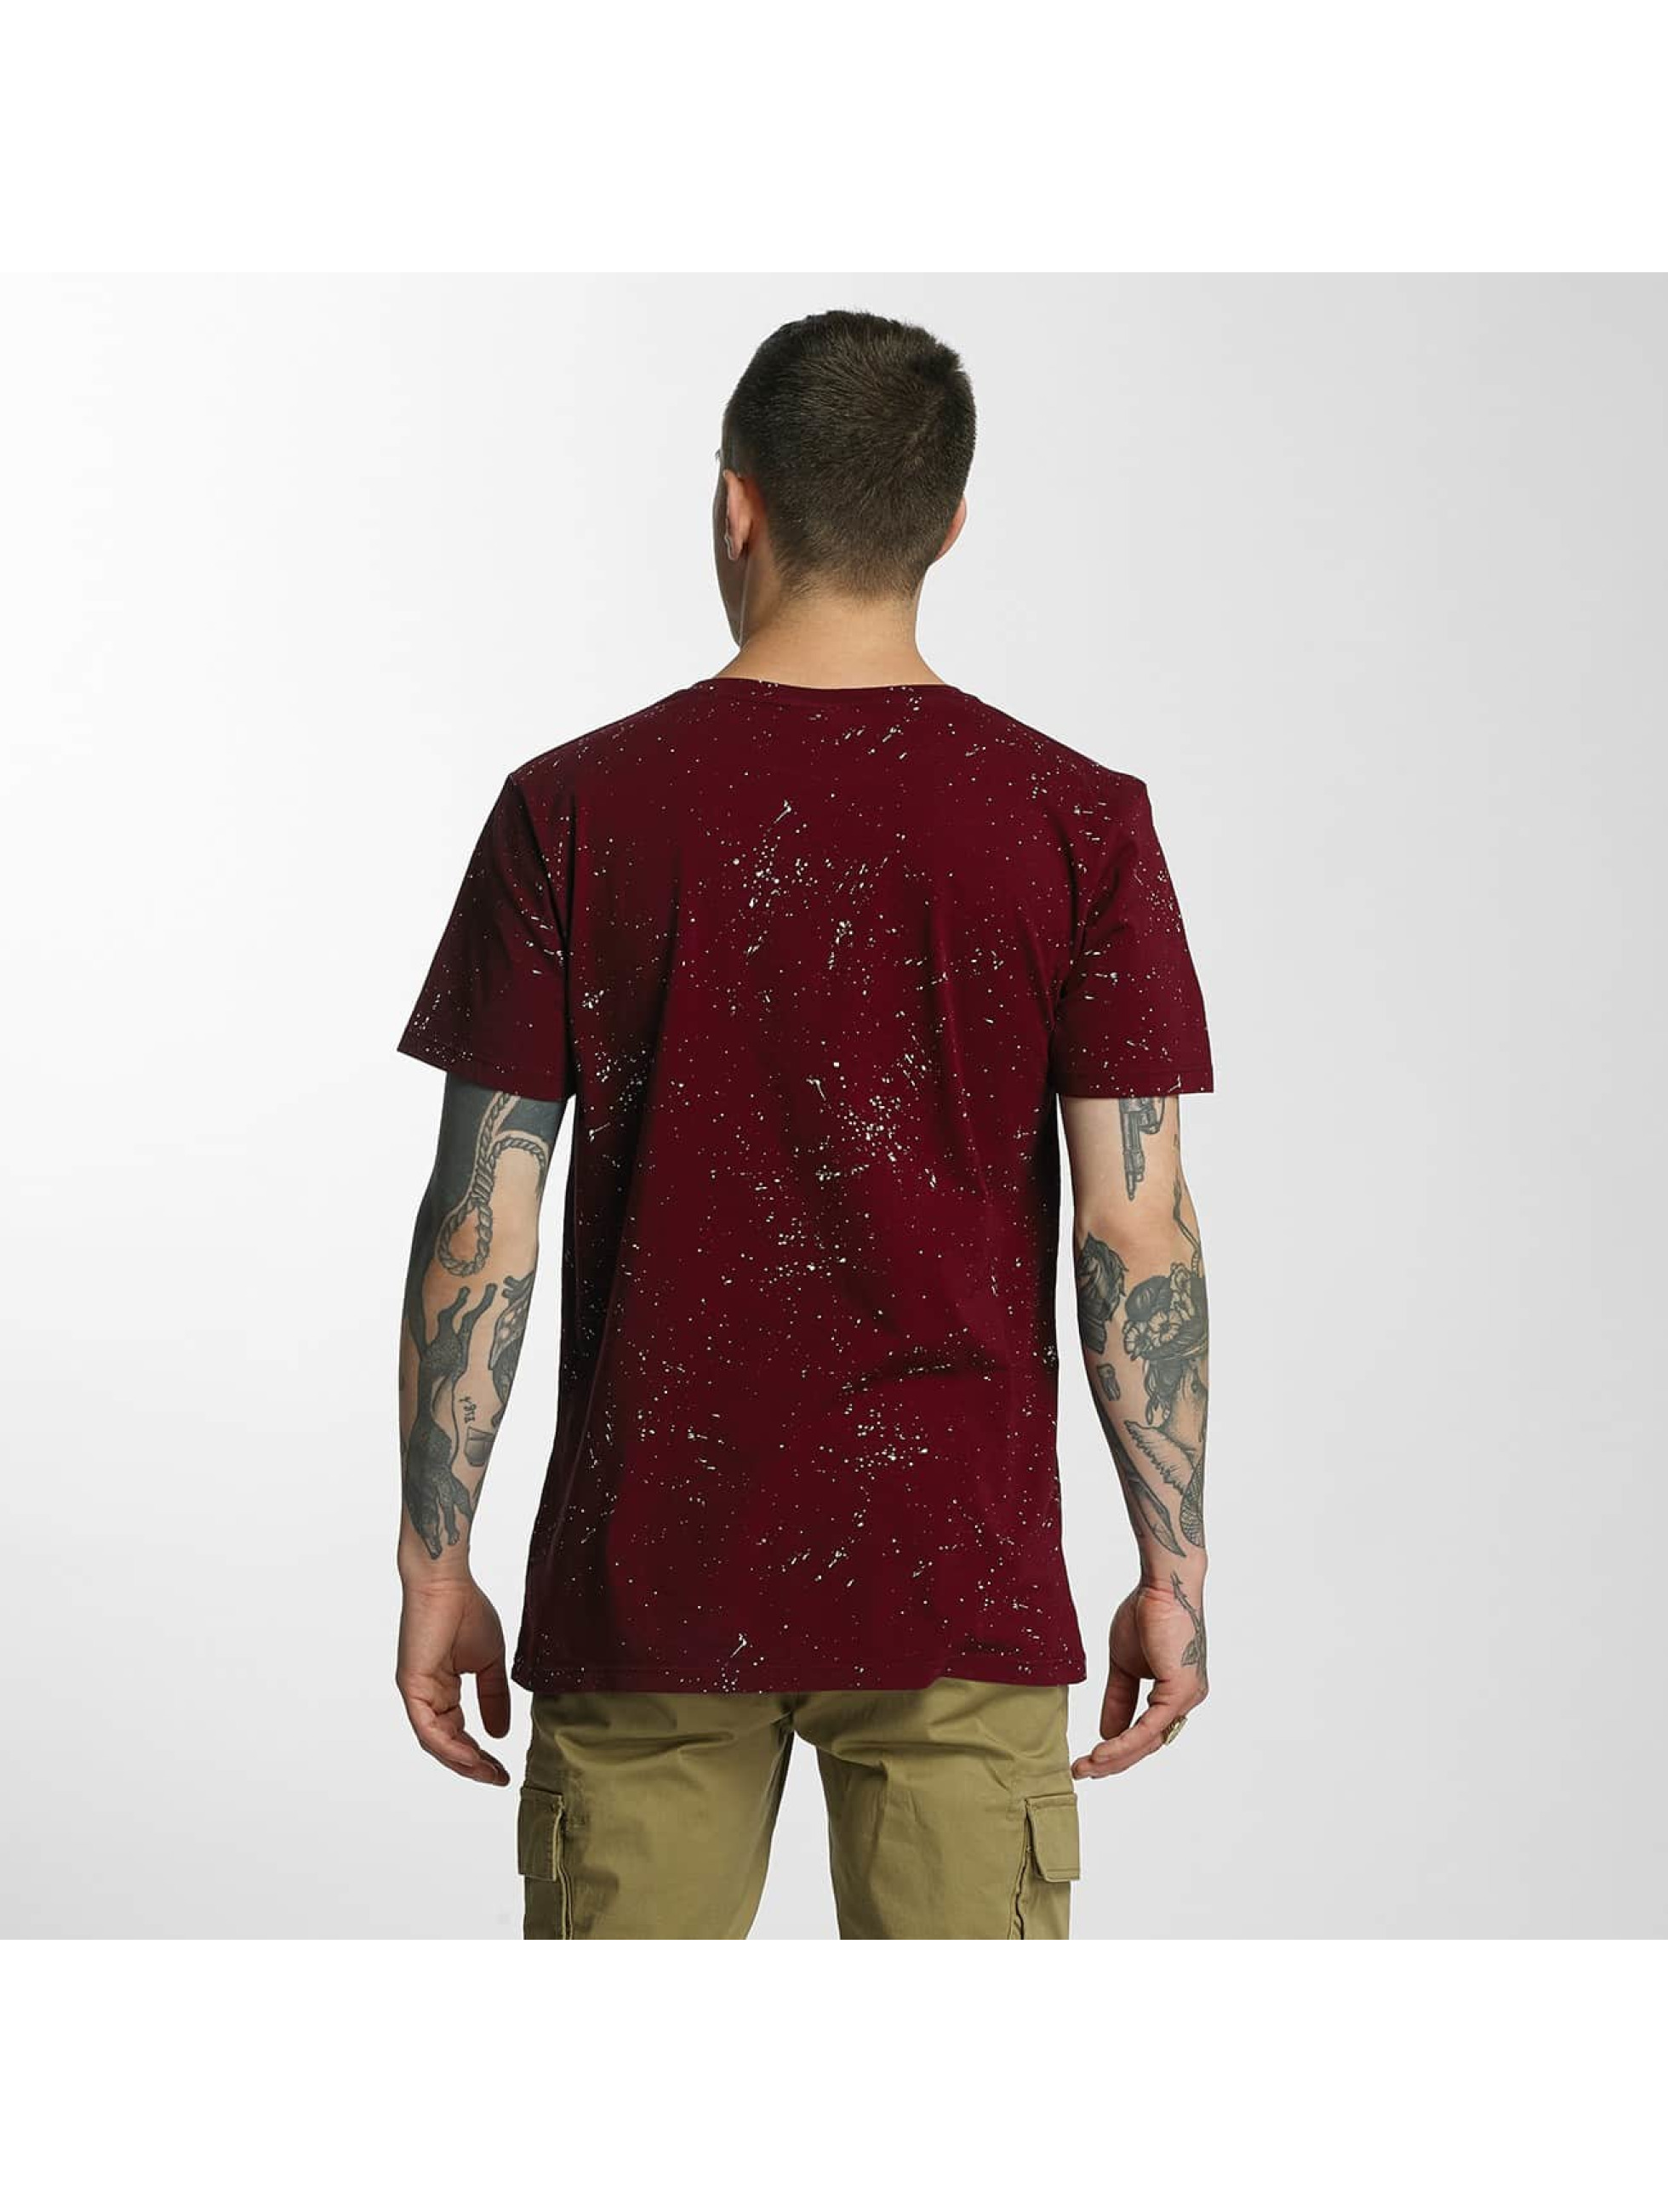 HYPE Camiseta Aop Speckle rojo